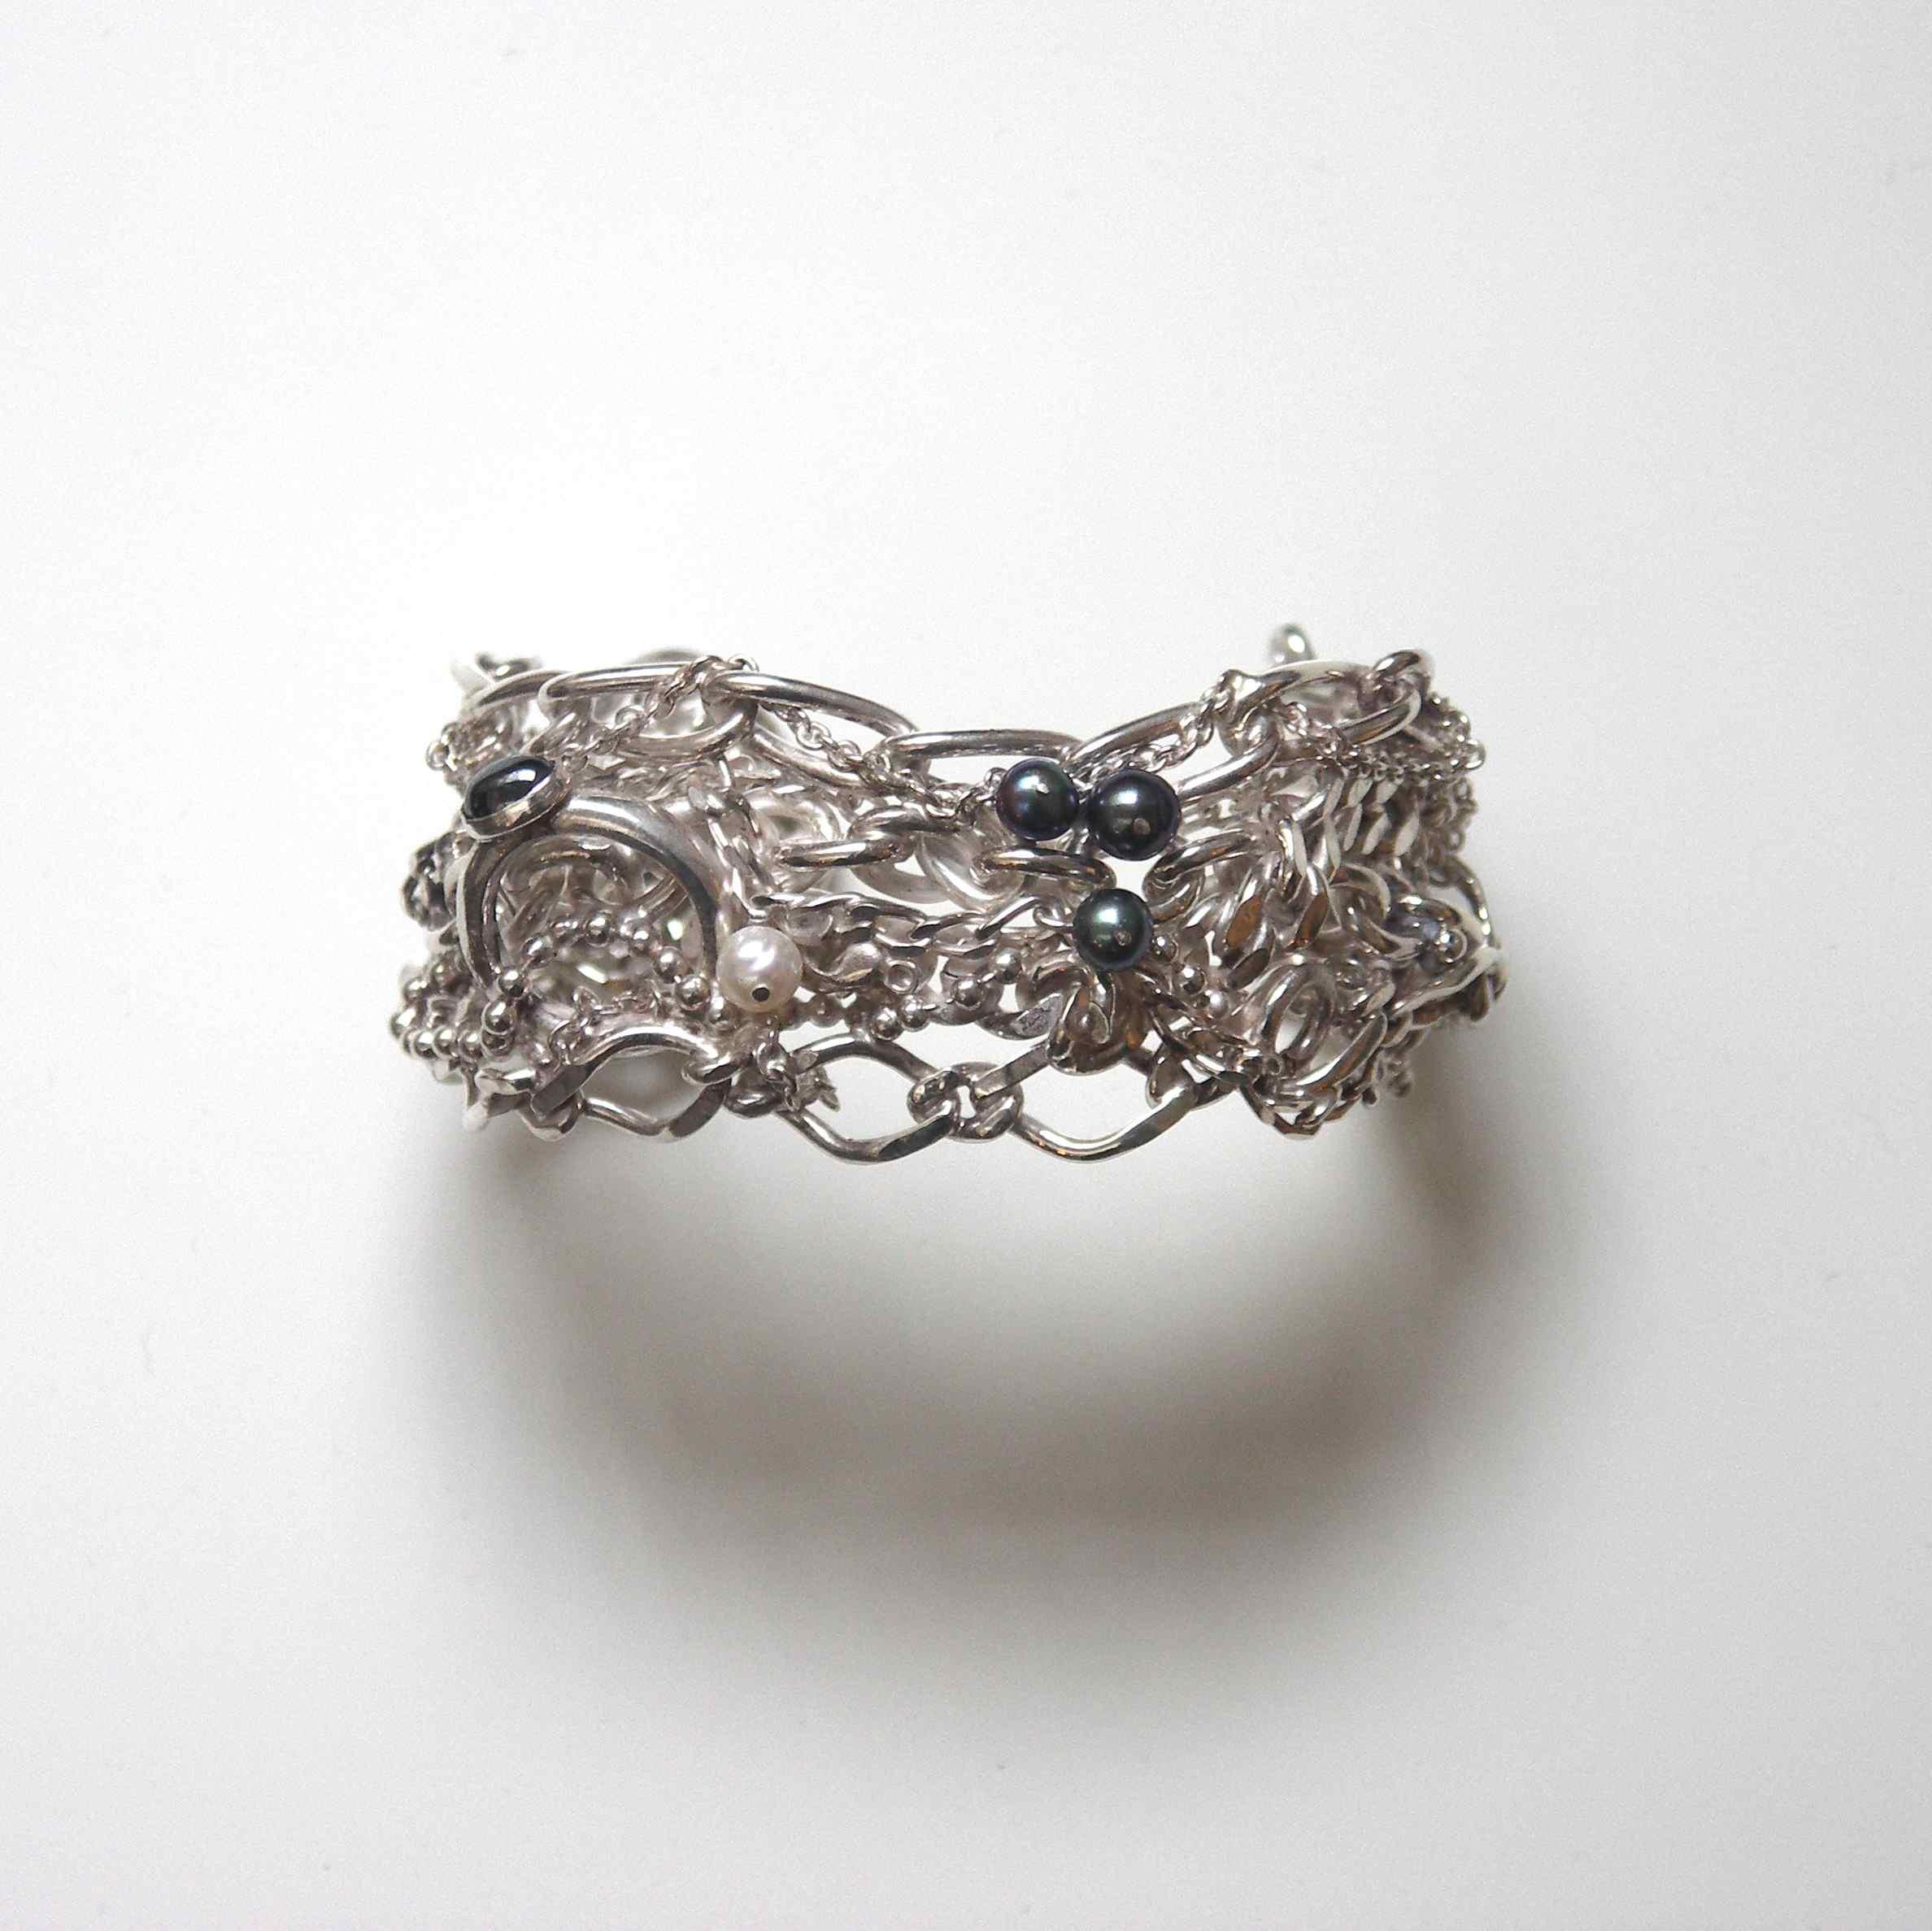 TCCB-Tangled chain and black pearl cuff